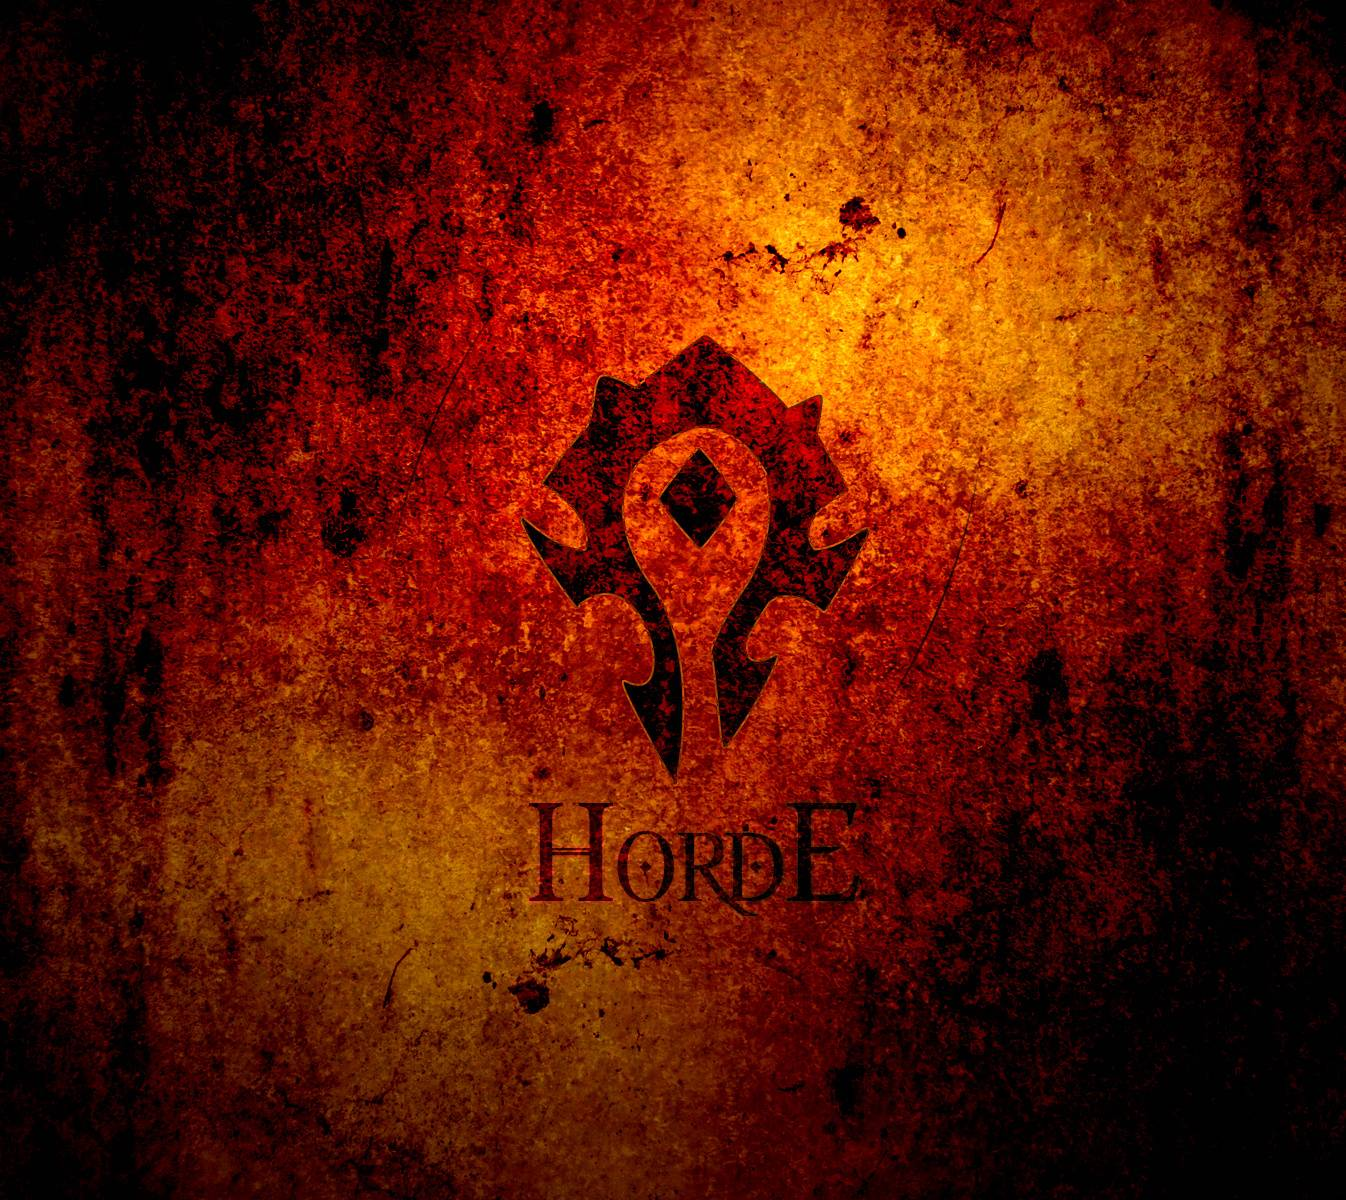 Horde Logo Wallpaper By Jakzy 78 Free On Zedge